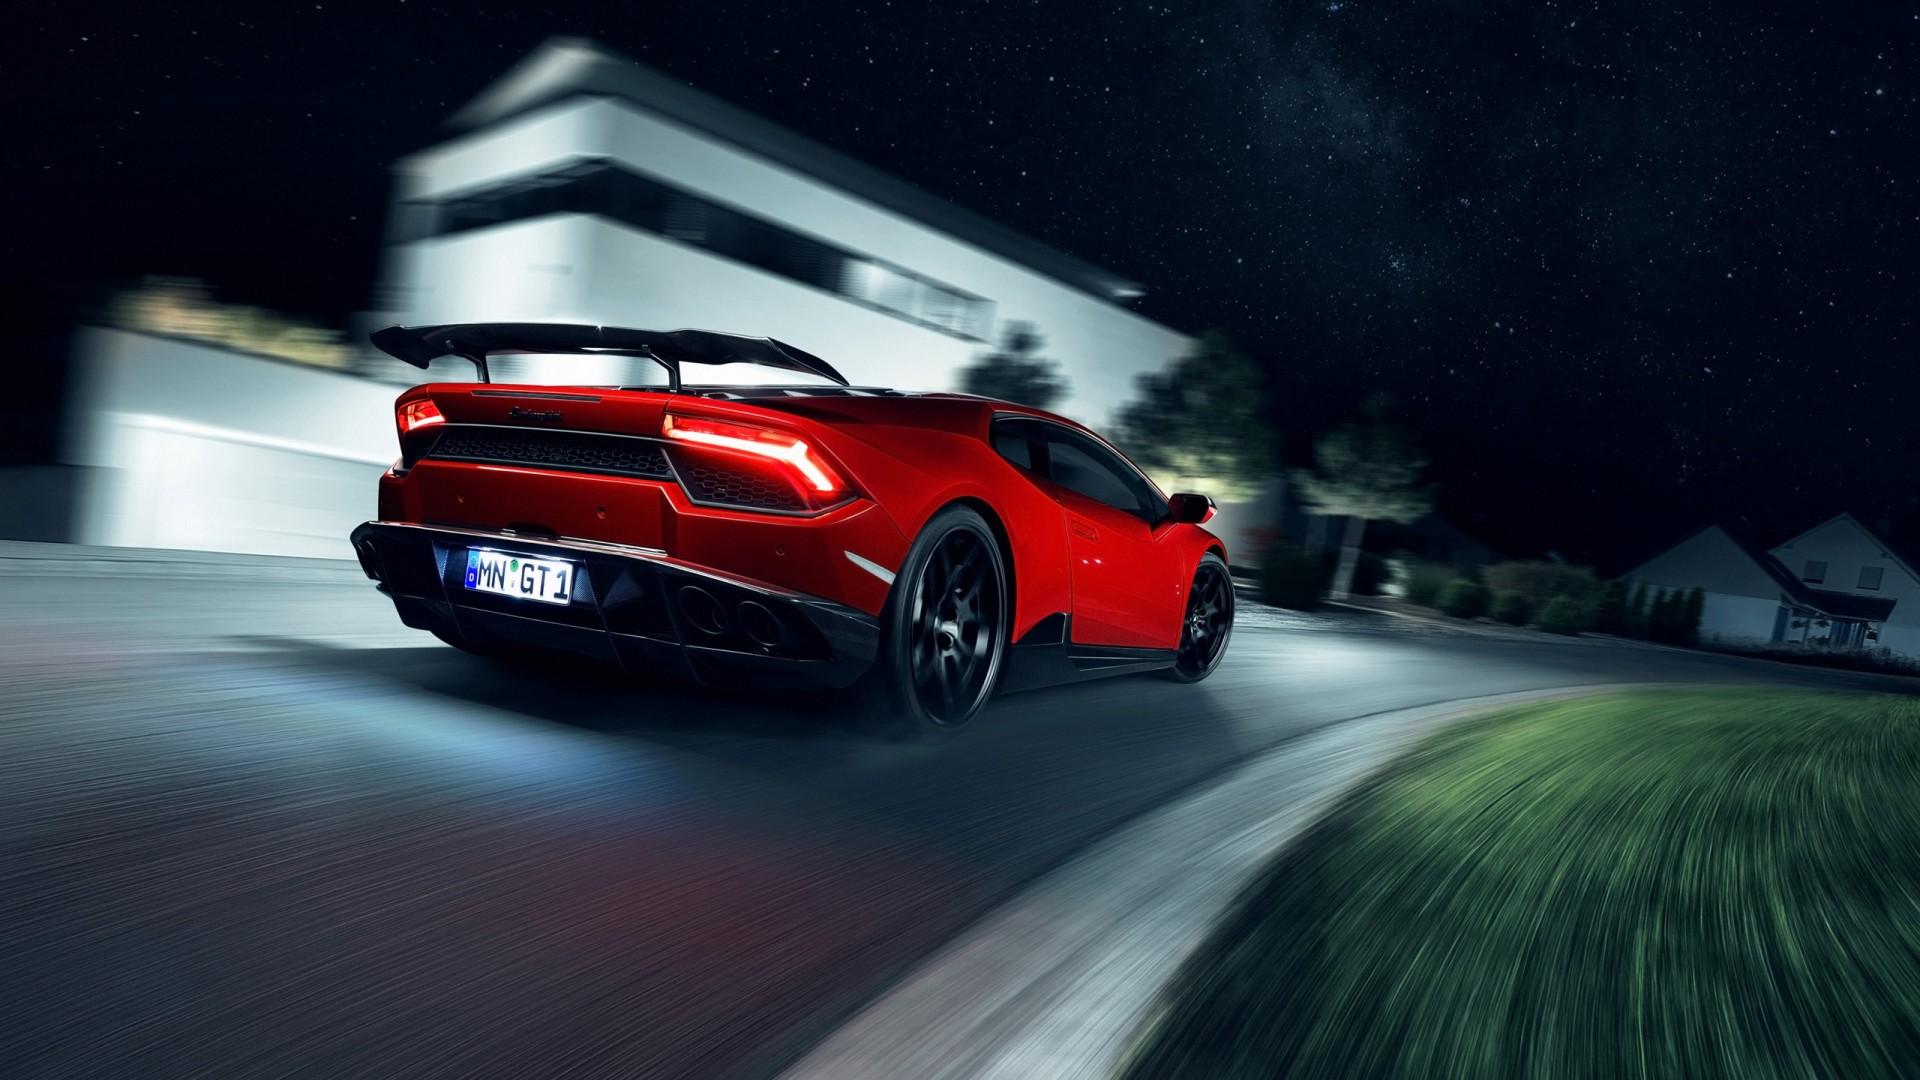 Mustang Car Wallpaper 2016 Novitec Torado Lamborghini Huracan Rwd Coupe 2